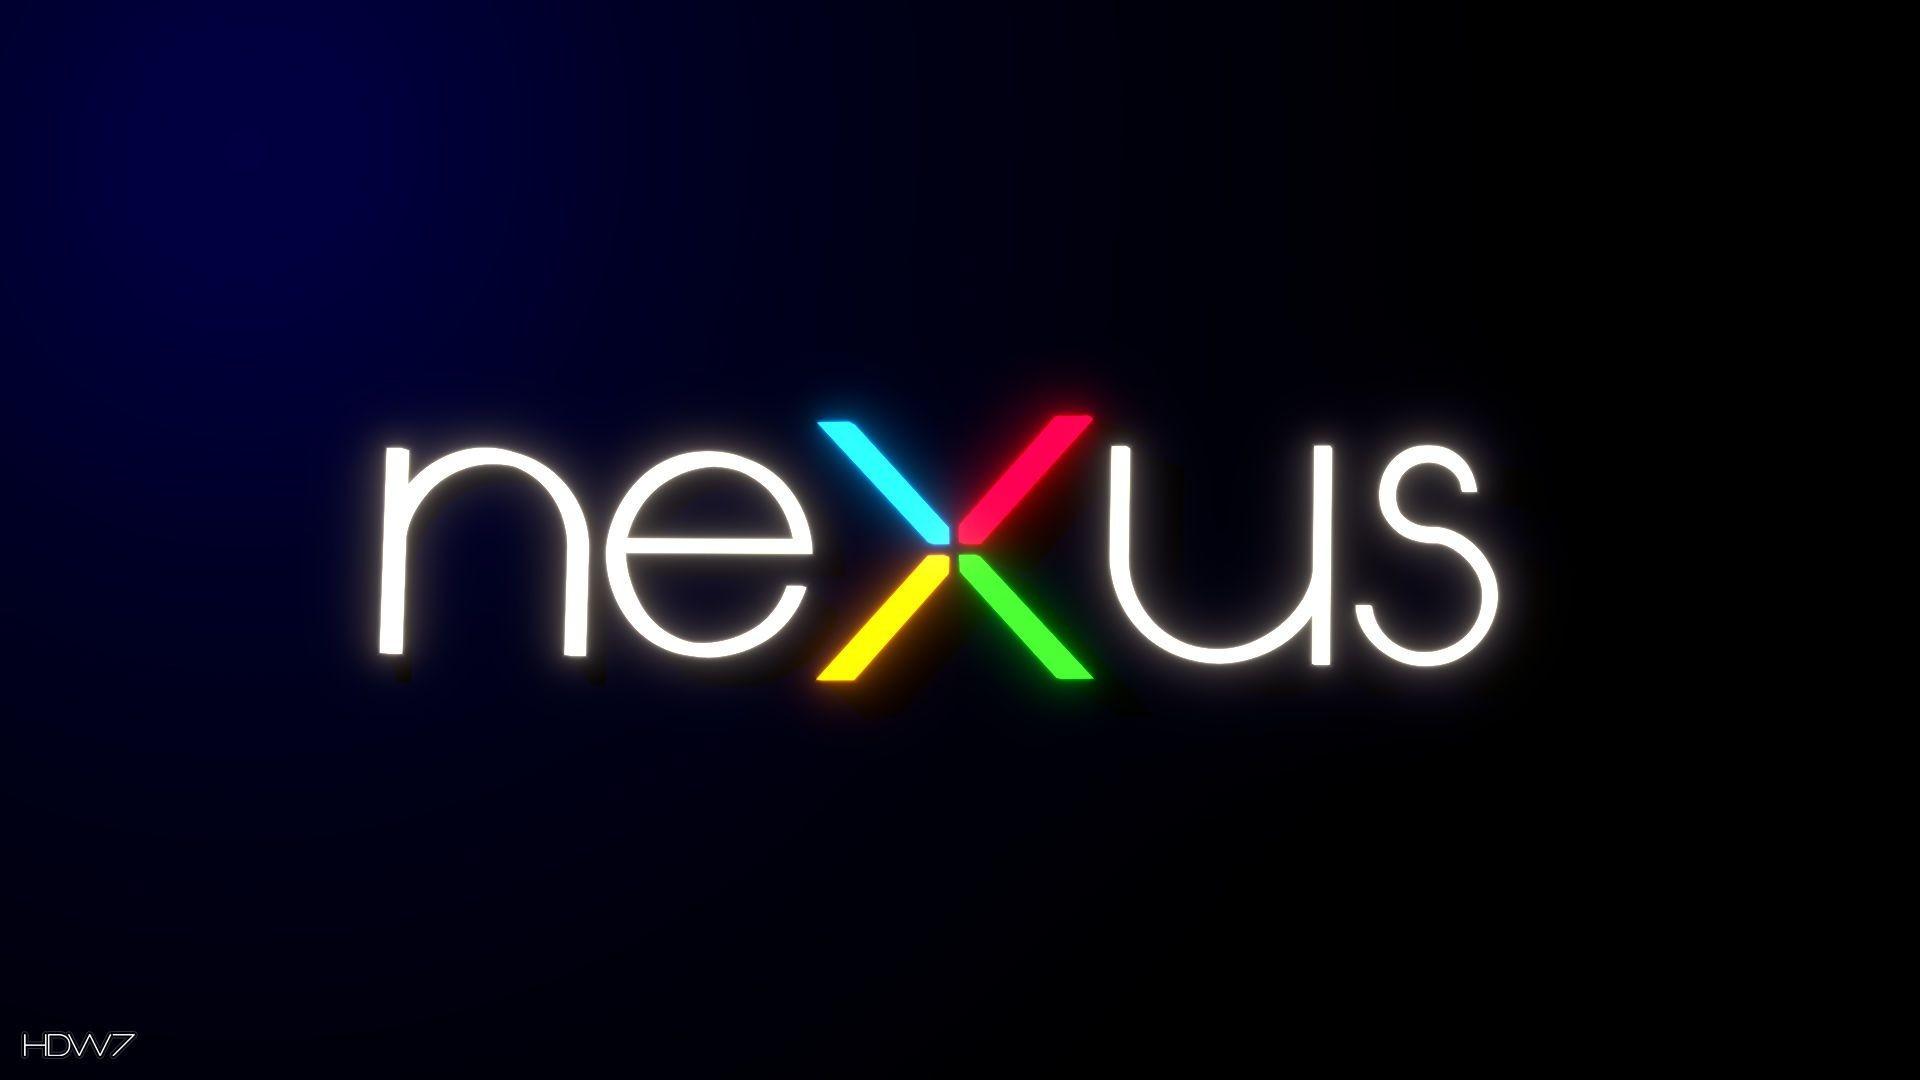 WWE Nexus Logo Wallpapers Wallpaper 1920×1080